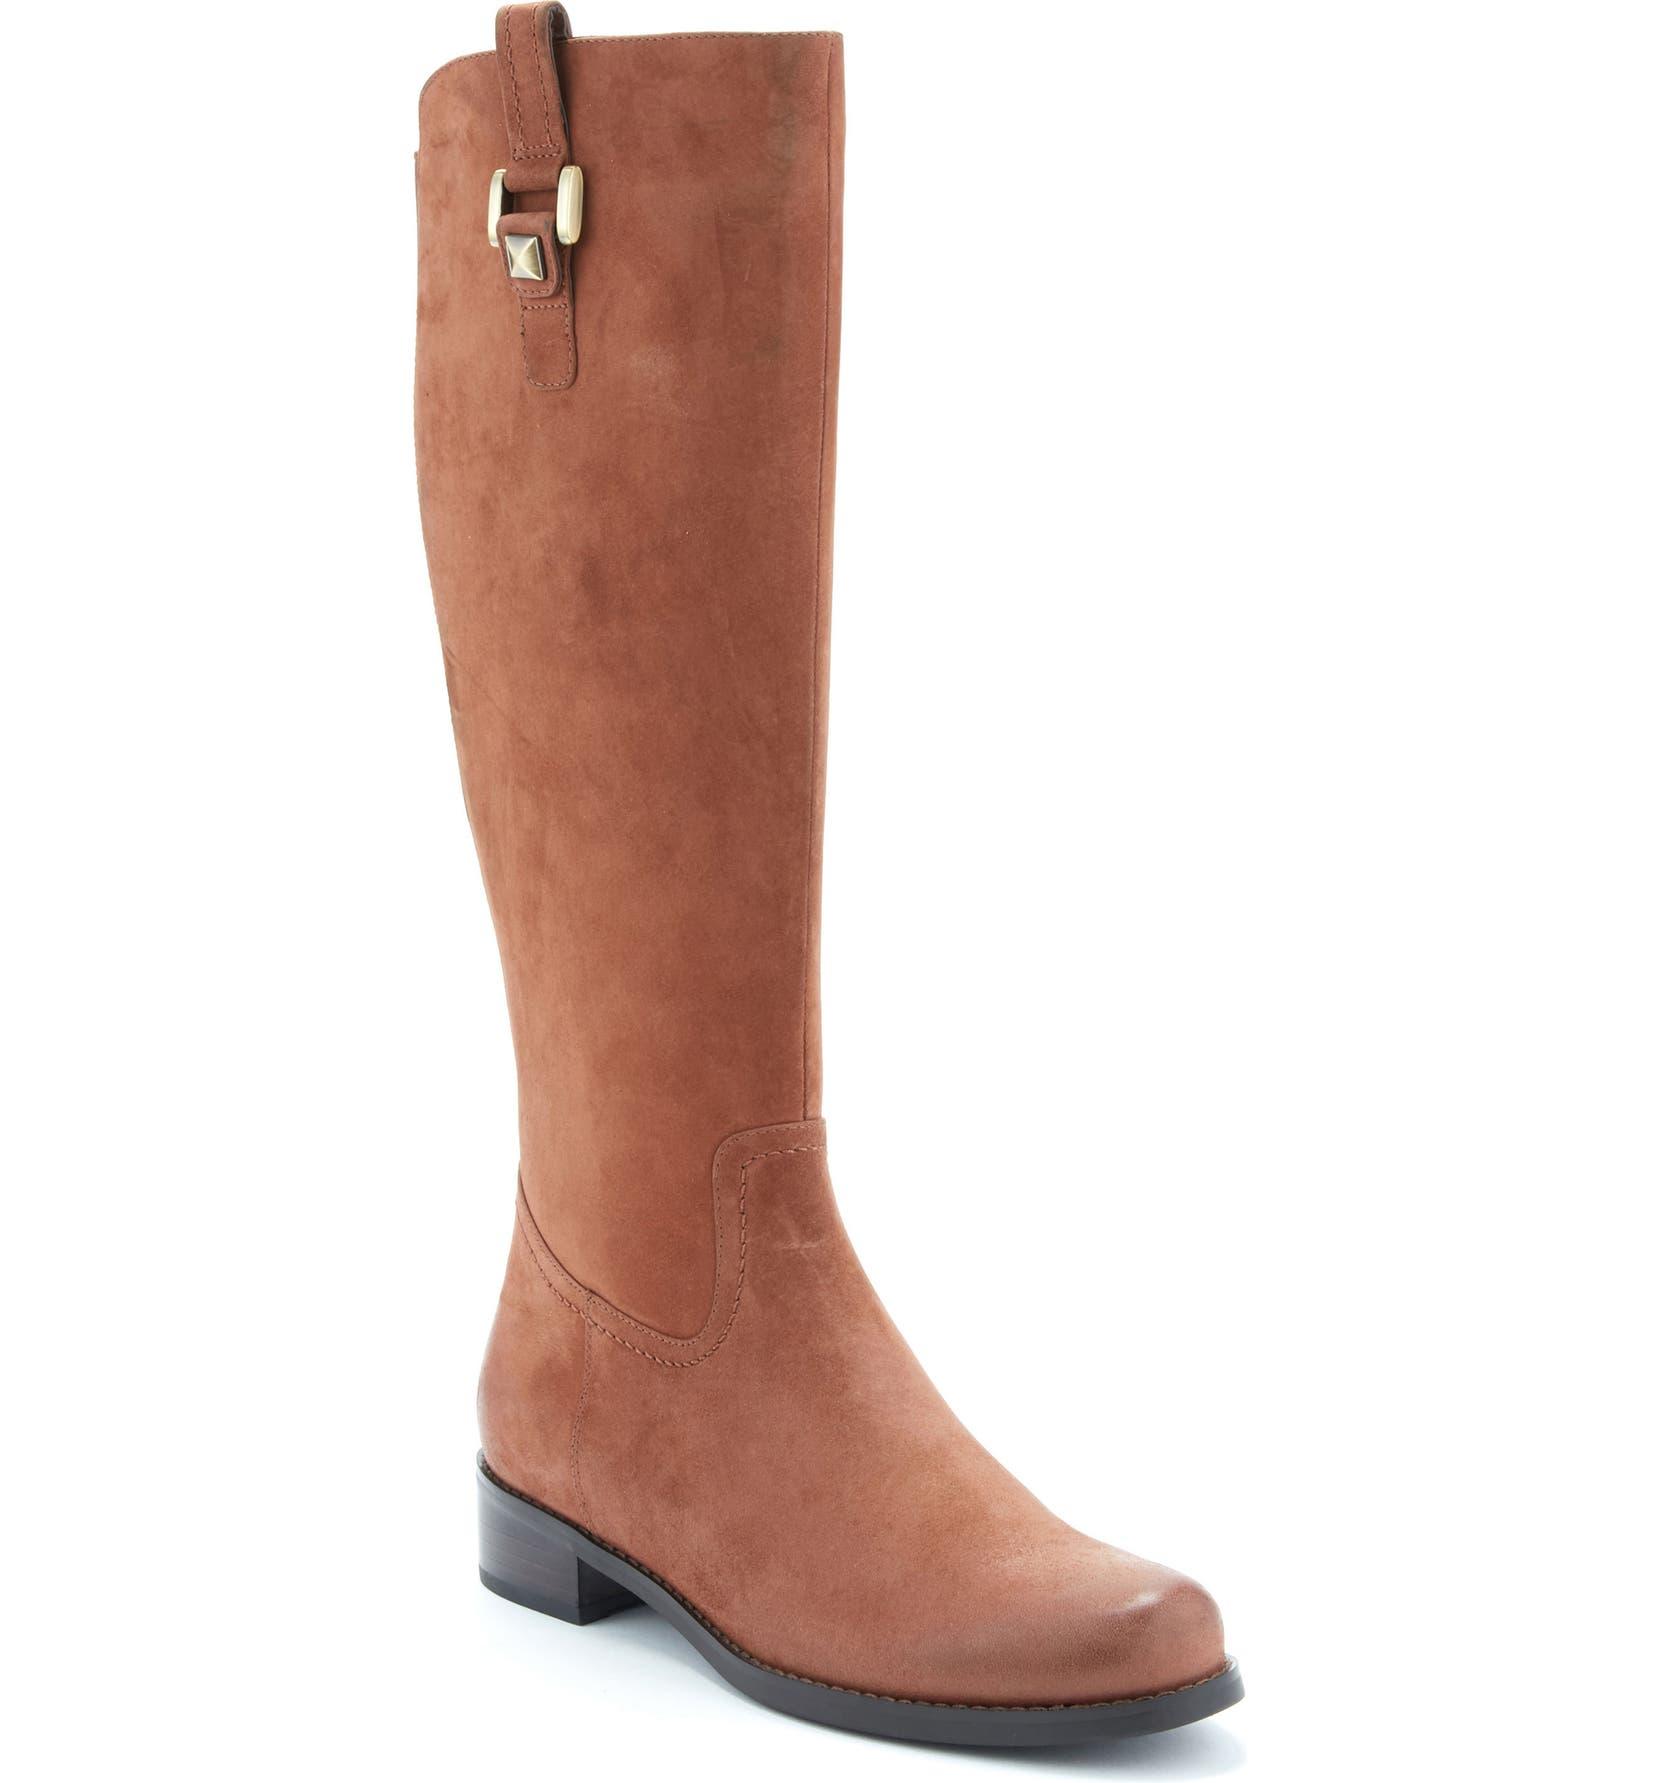 afda89abb42 'Velvet' Waterproof Riding Boot